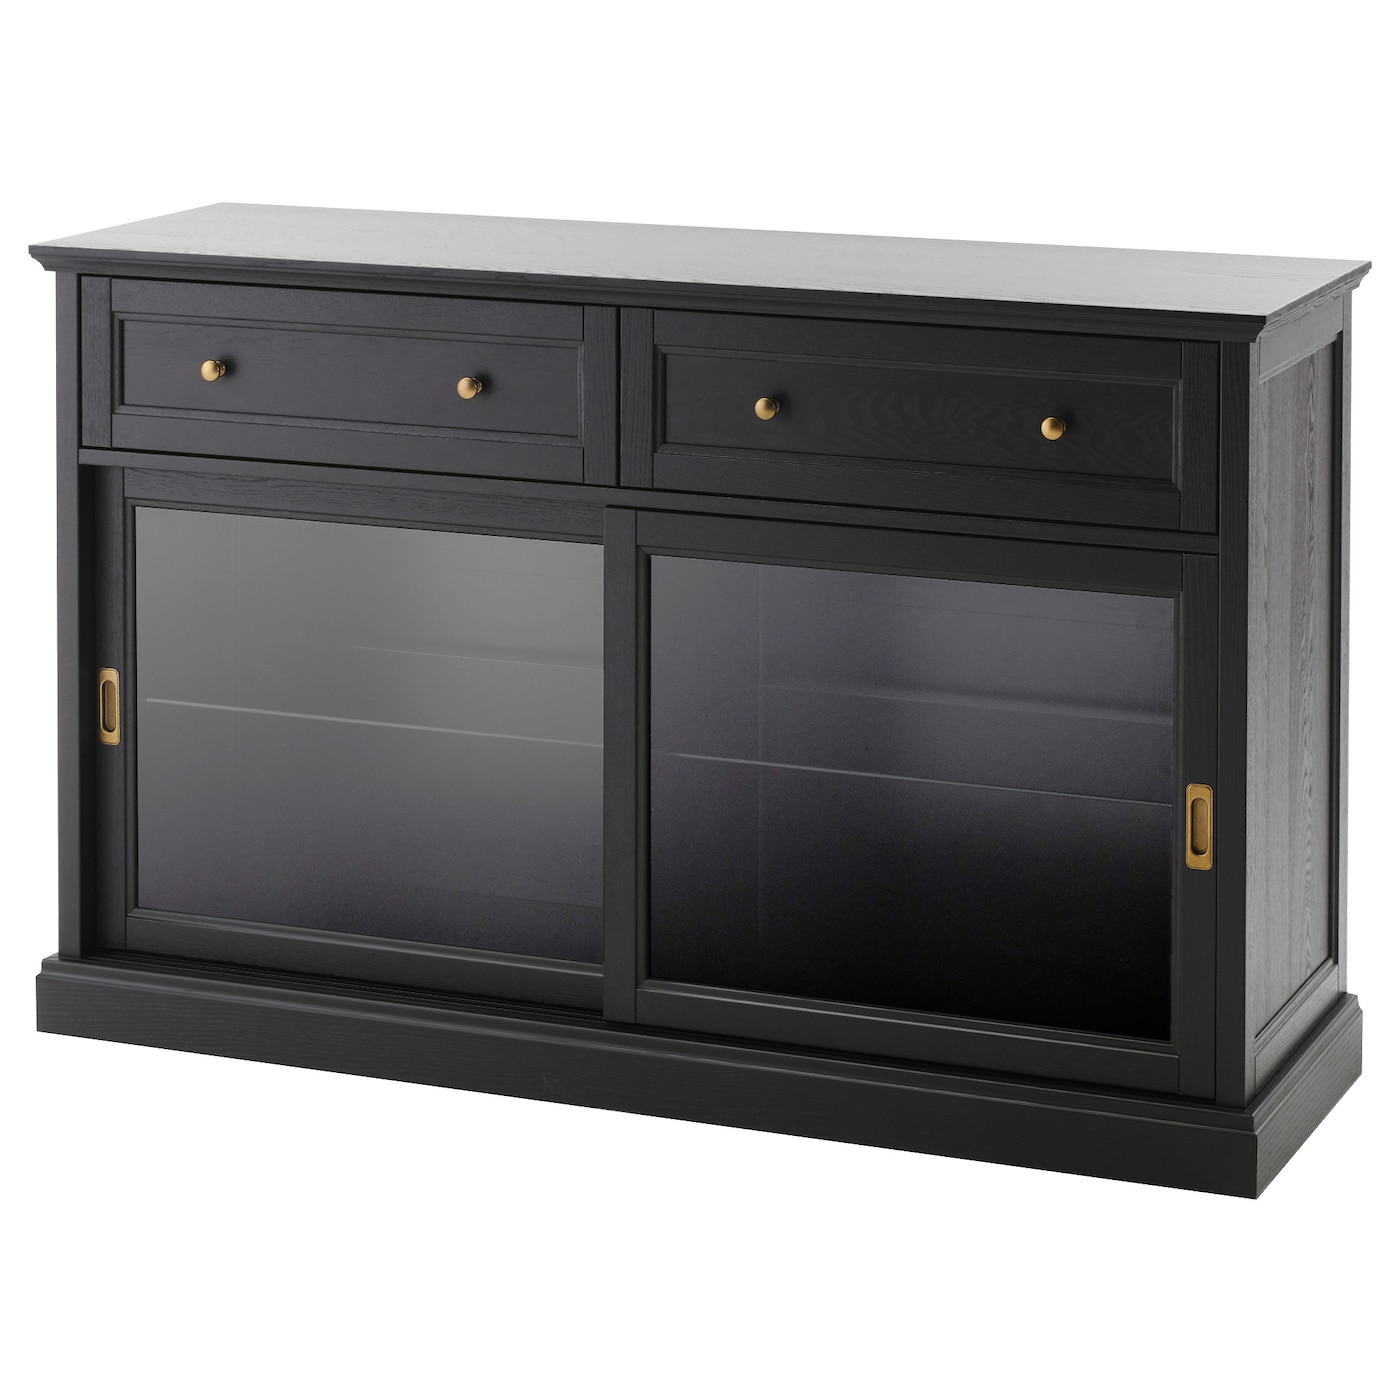 Malsj Meuble Bas Teint Noir 145×92 Cm Ikea # Meuble Bas Ikea